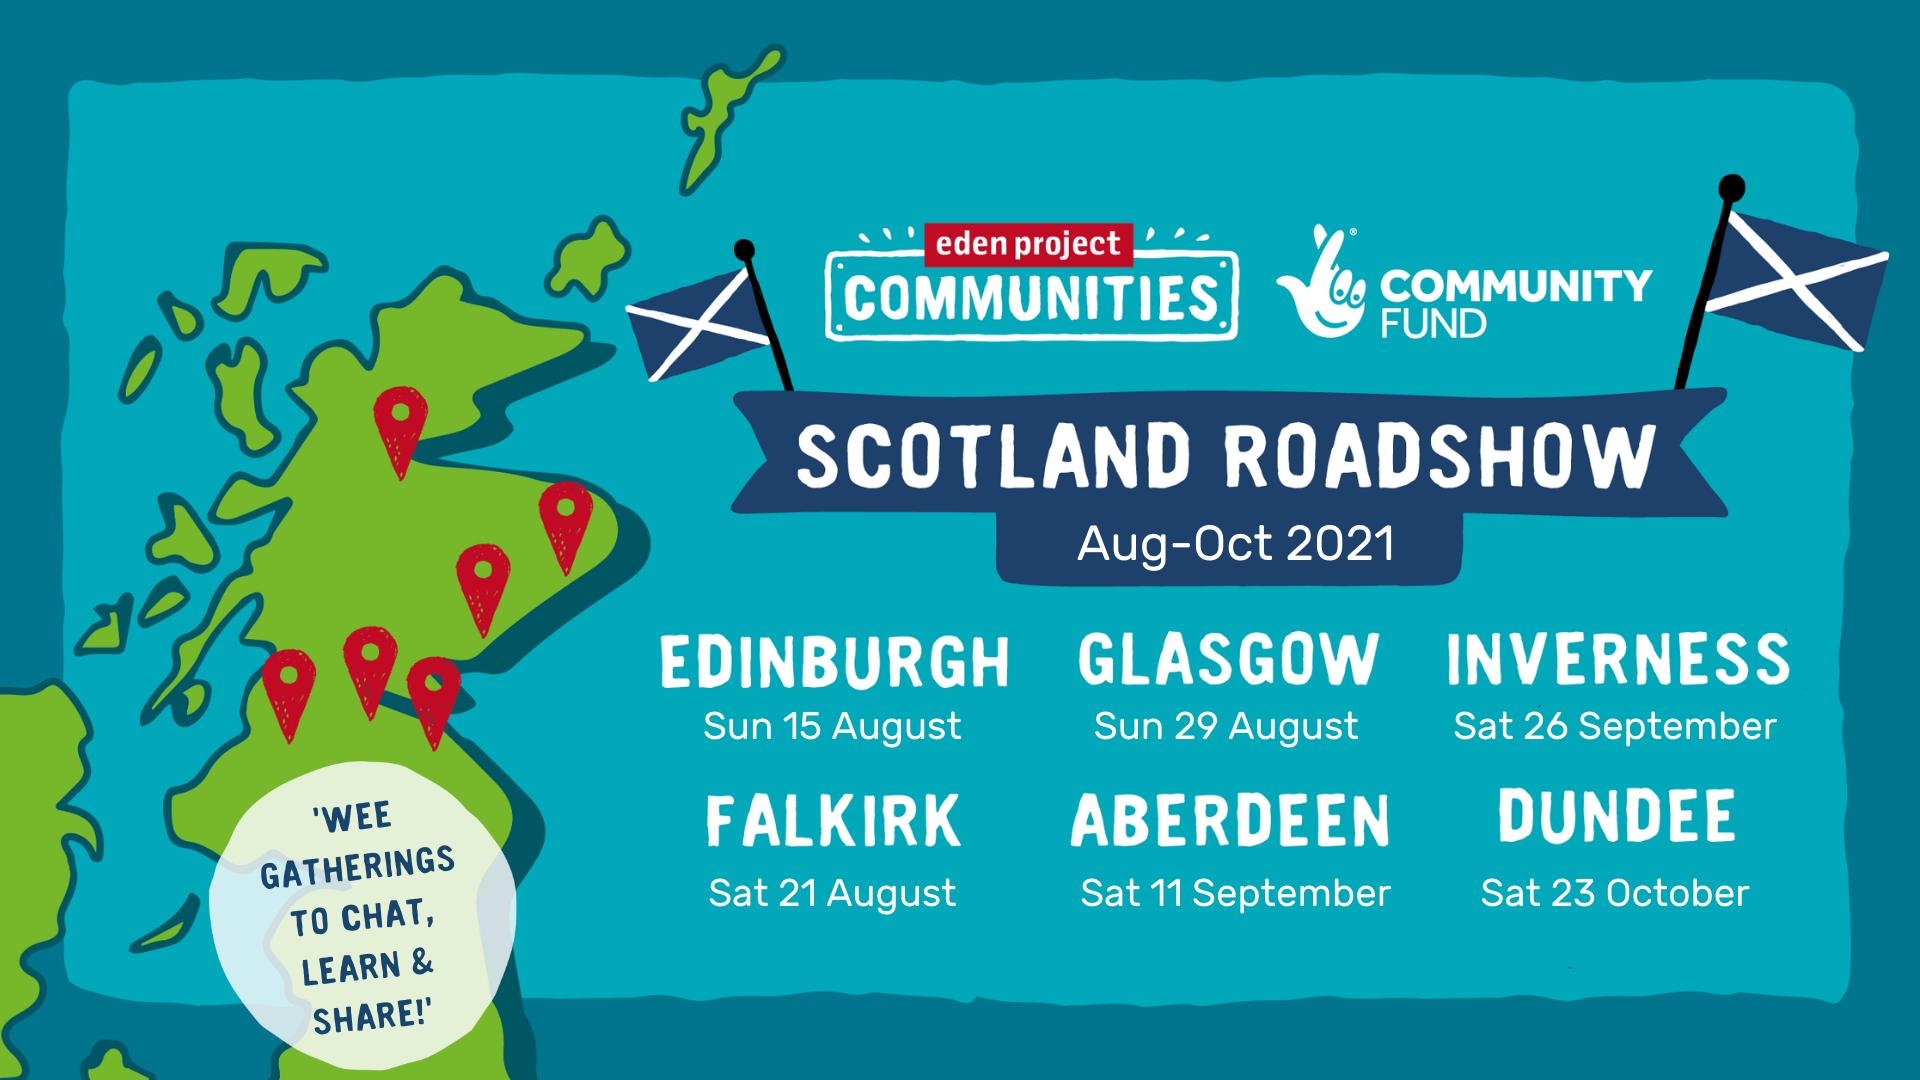 Graphic showing Scotland Roadshow dates